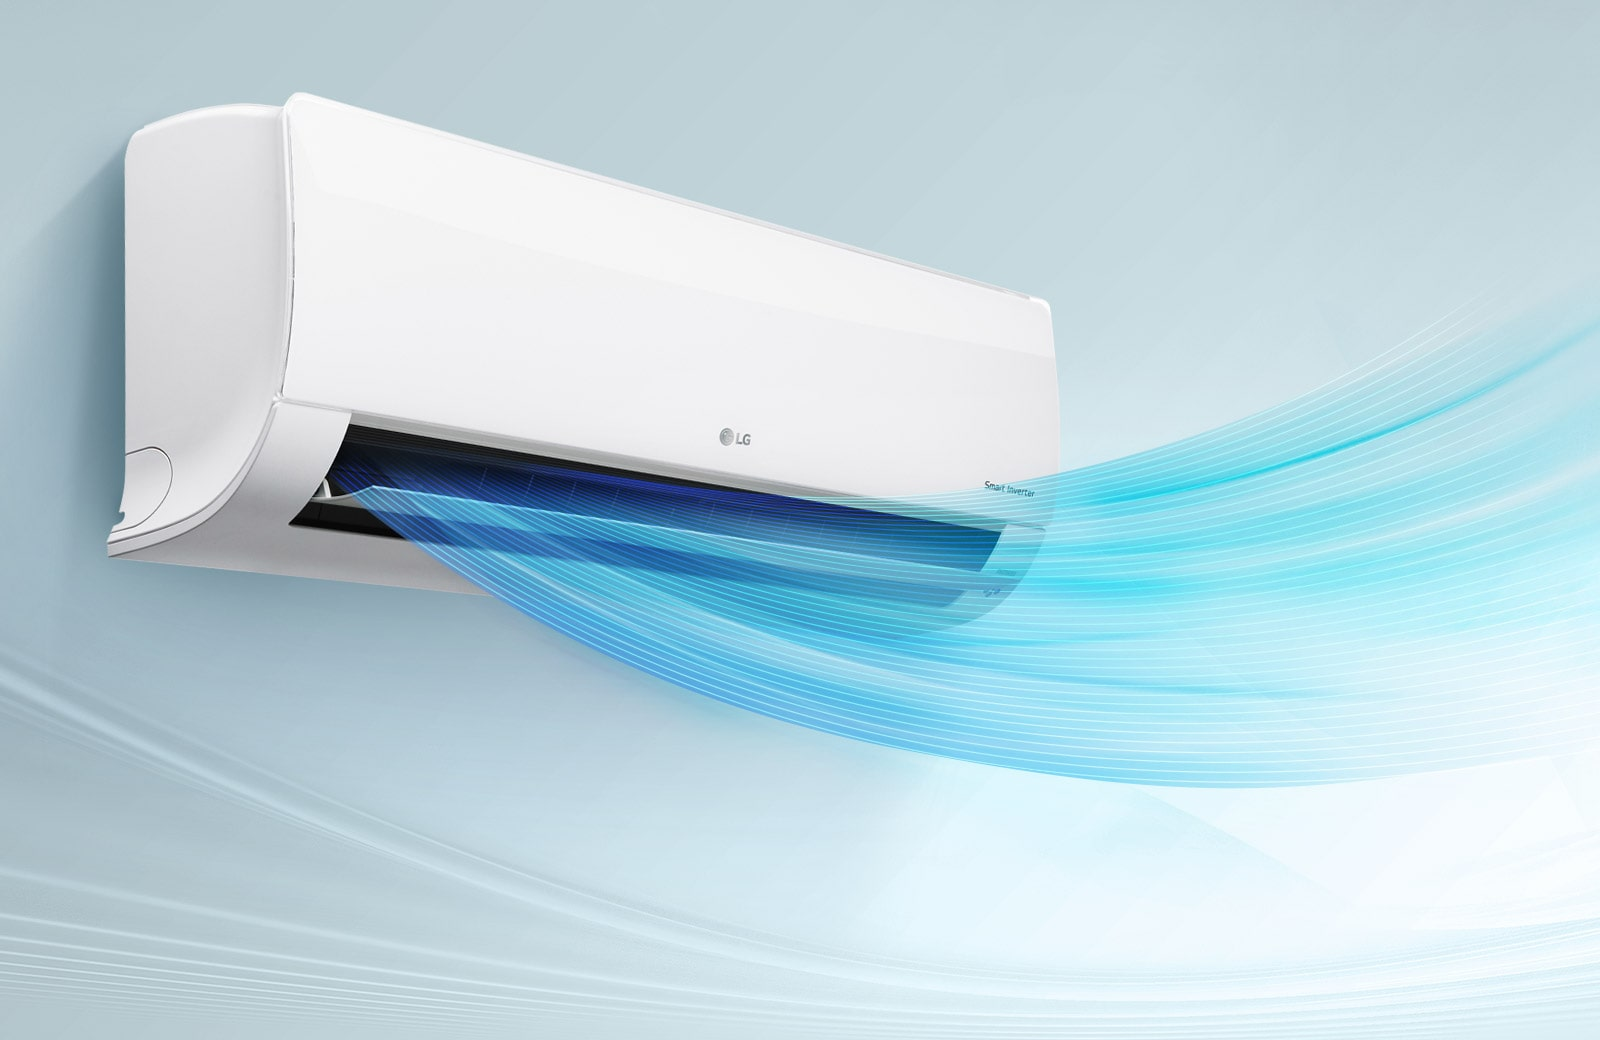 M01_Fast-cooling_DM09RP_D_01